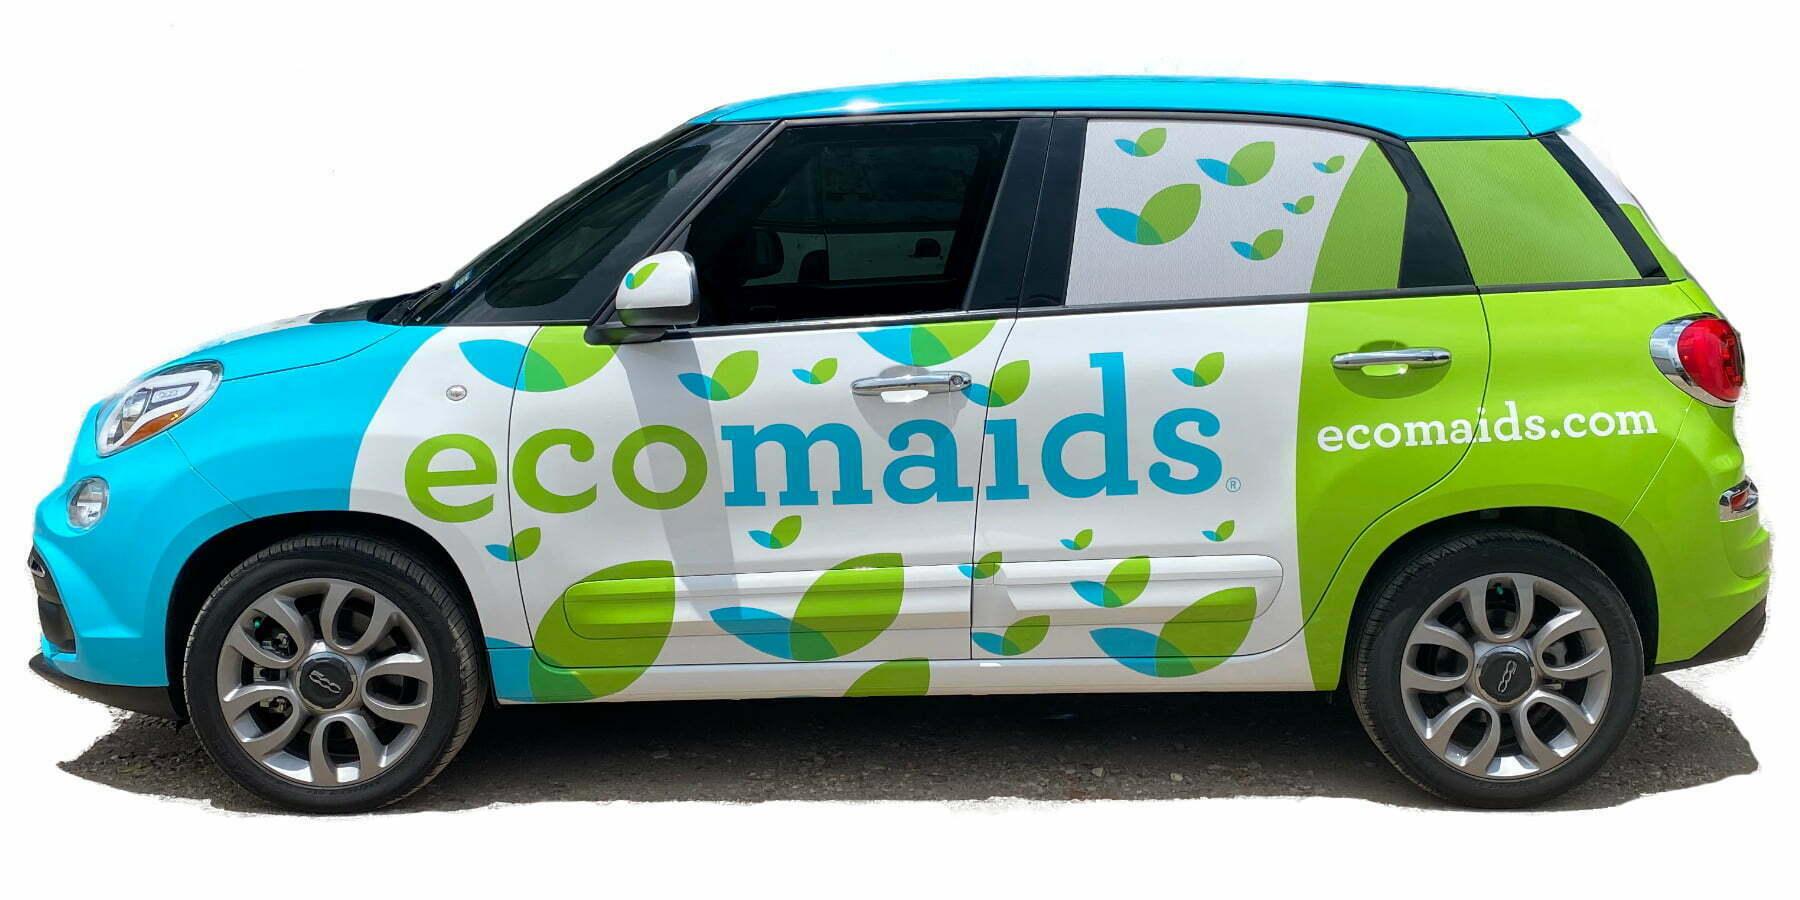 Fiat Full Car Wrap Houston Graphics AtoZ Ecomaid